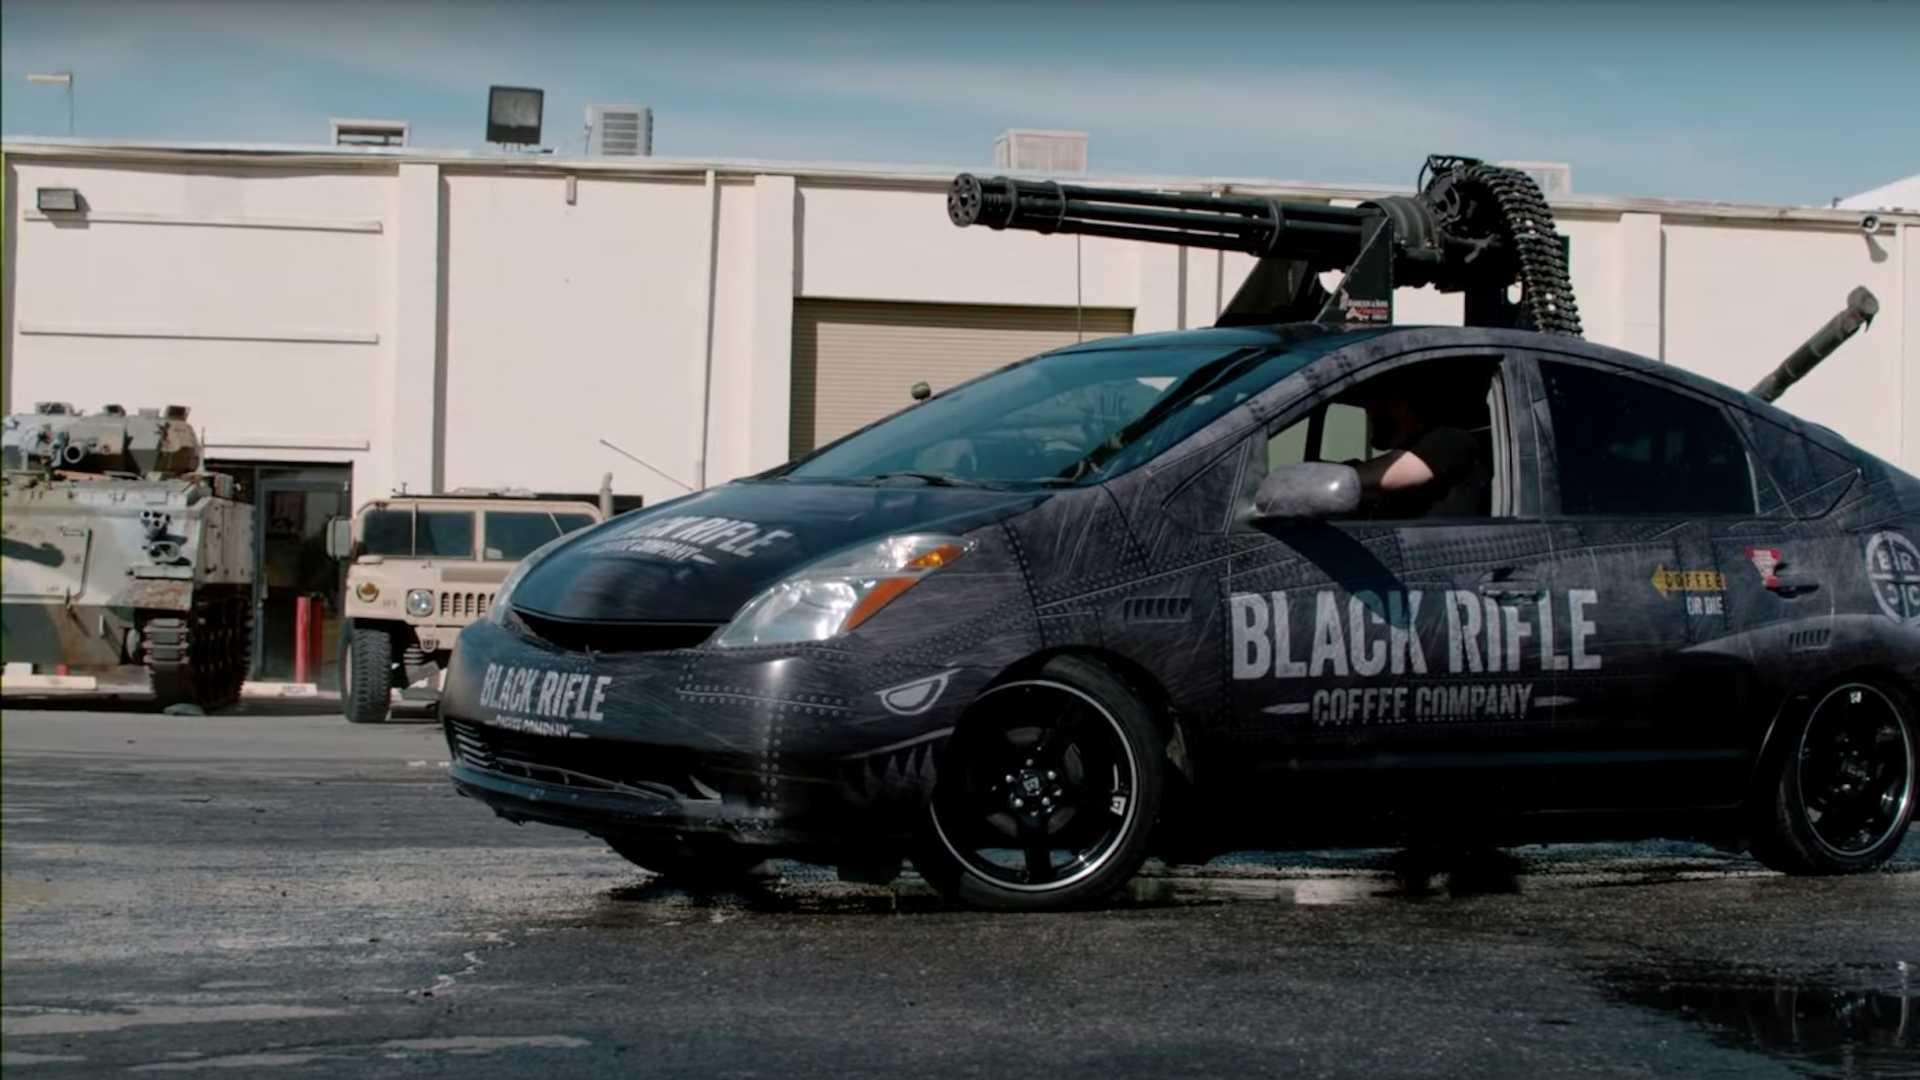 На днях Black Rifle Coffee Company, неожиданно для всех, представила Toyota Prius со стационарной турелью M61 Vulcan на крыше